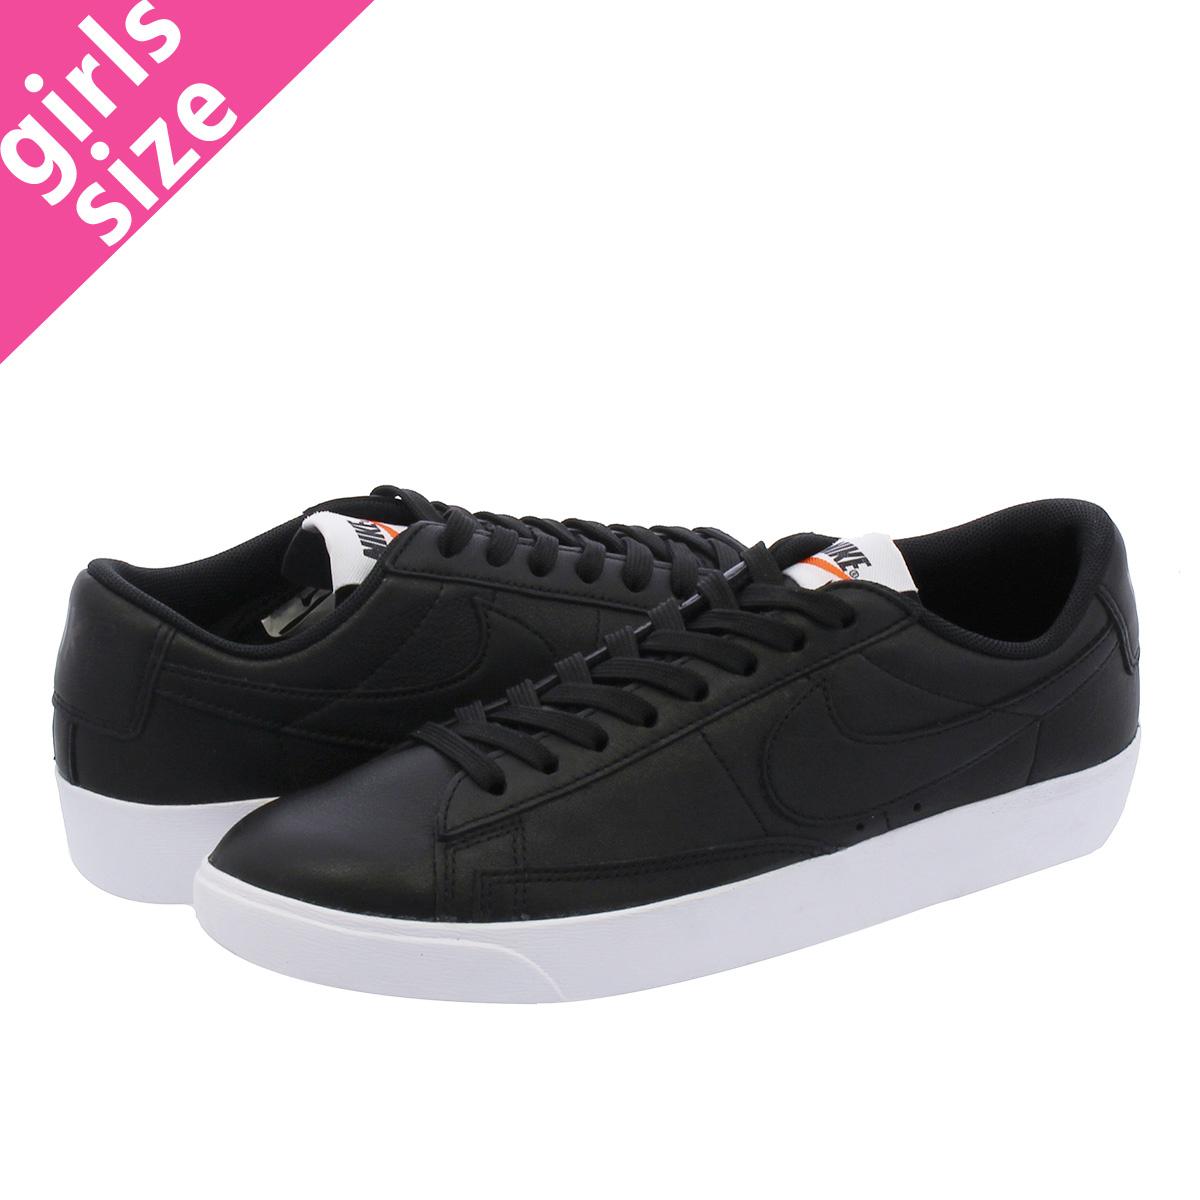 new styles 2bff9 43886 NIKE WMNS BLAZER LOW LE Nike women blazer low LE BLACK/WHITE av9370-001